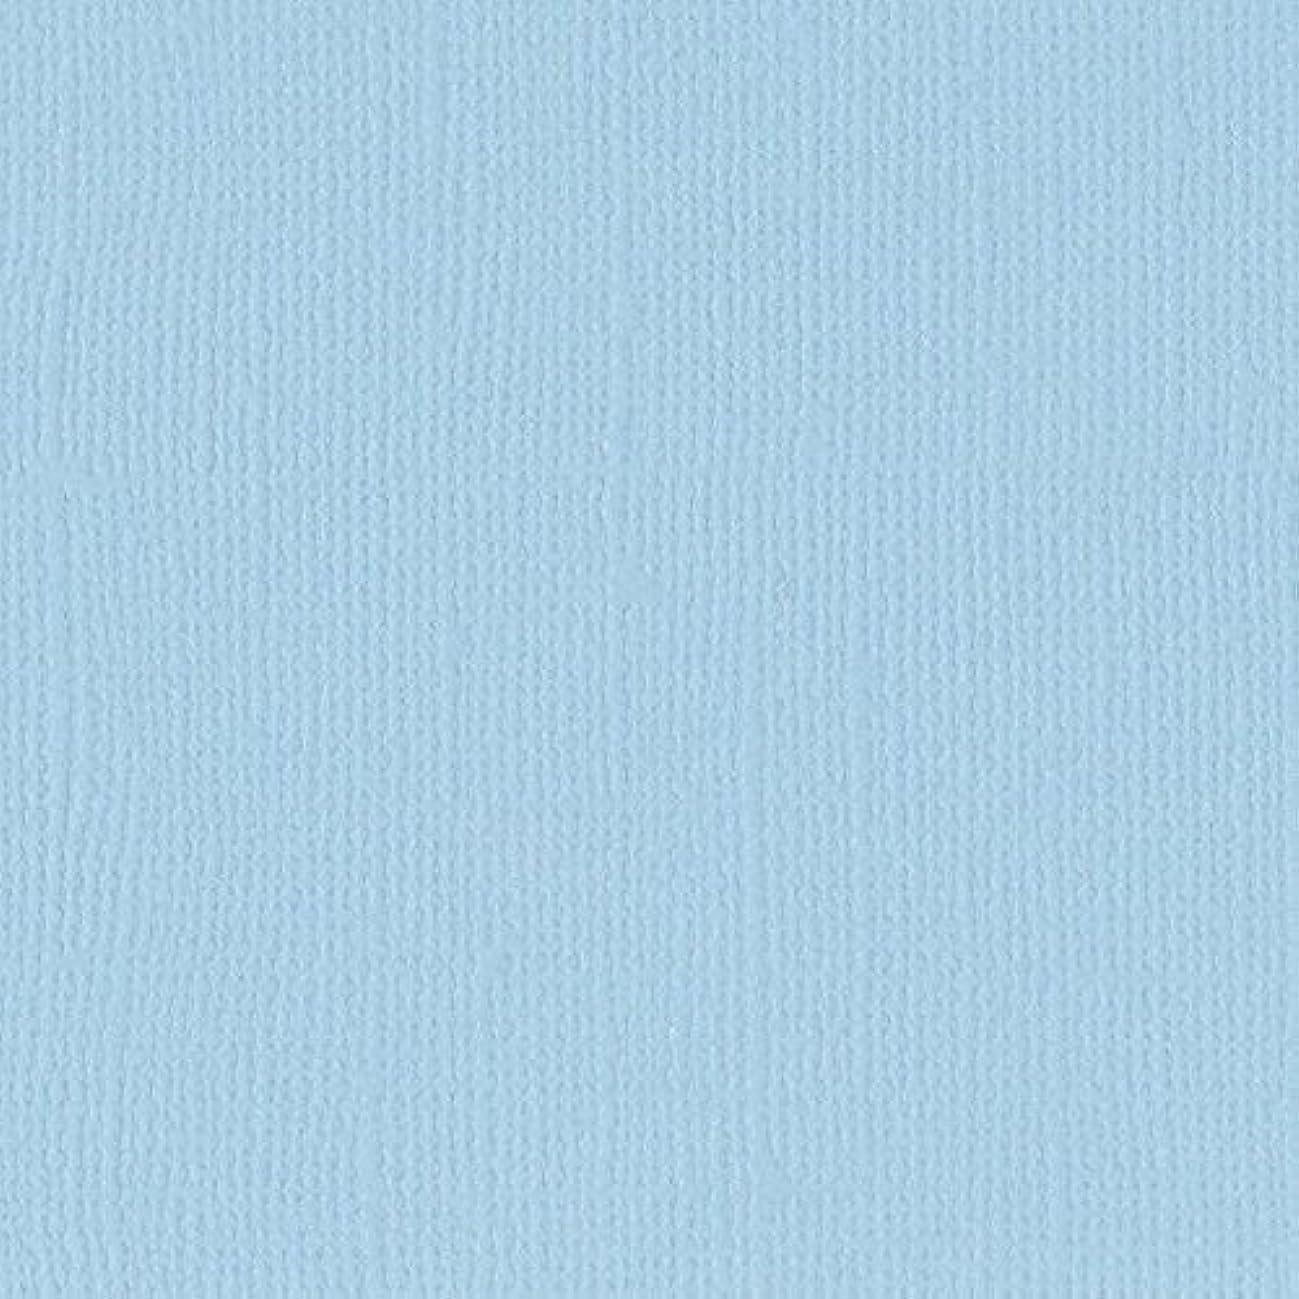 Vaessen Creative A4 Texture Florence Cardstock Canvas, Paper, Glacier, One Size